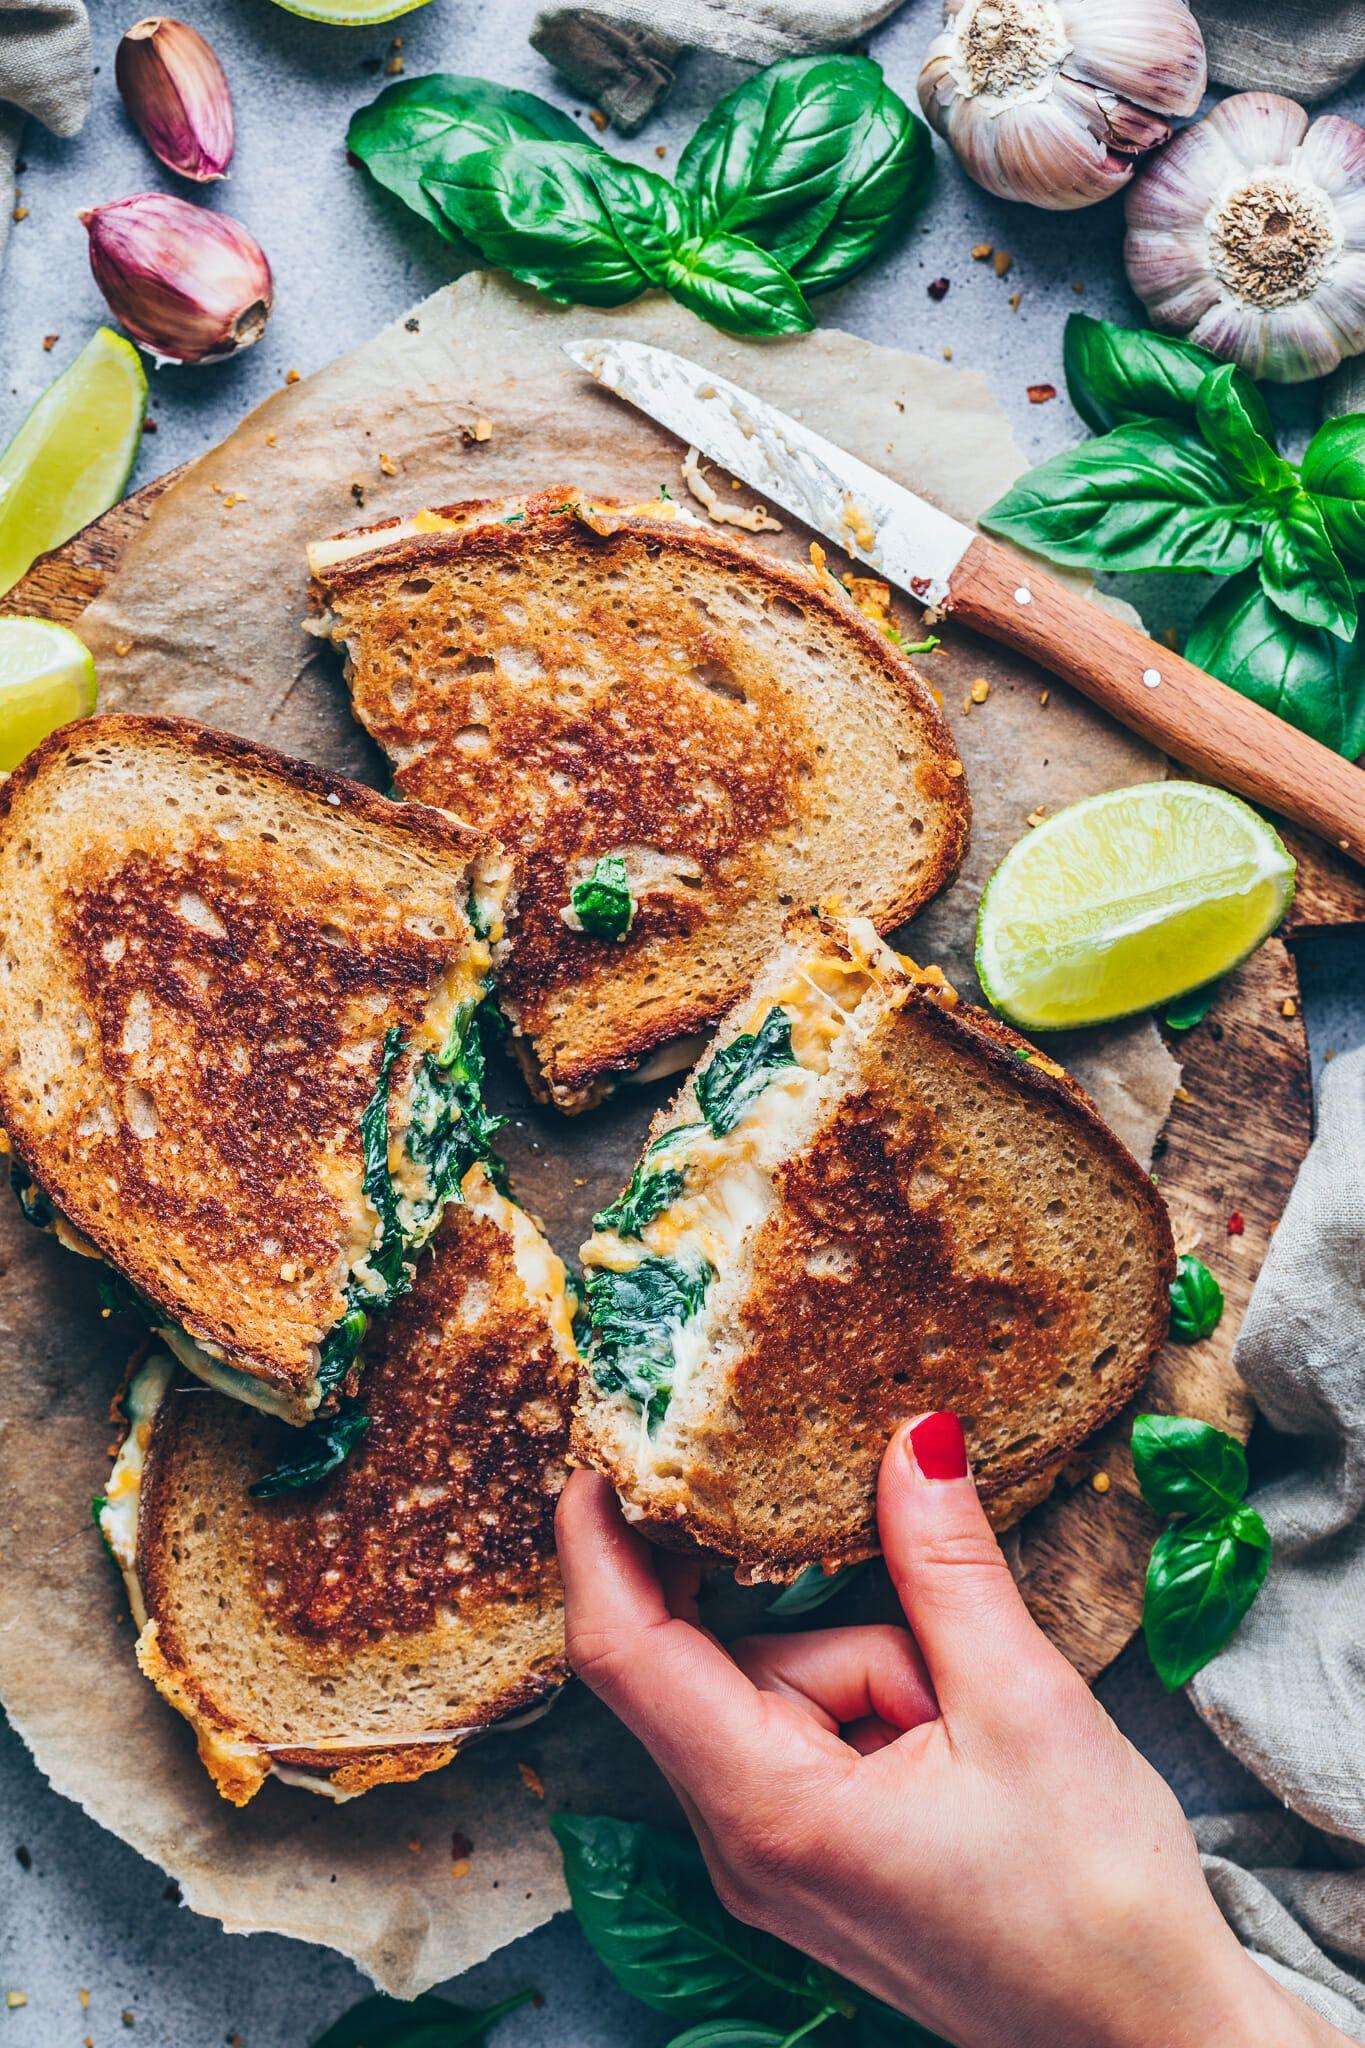 Grilled Cheese Sandwich Rezept | Veganes Käse-Sandwich - Bianca Zapatka | Rezepte